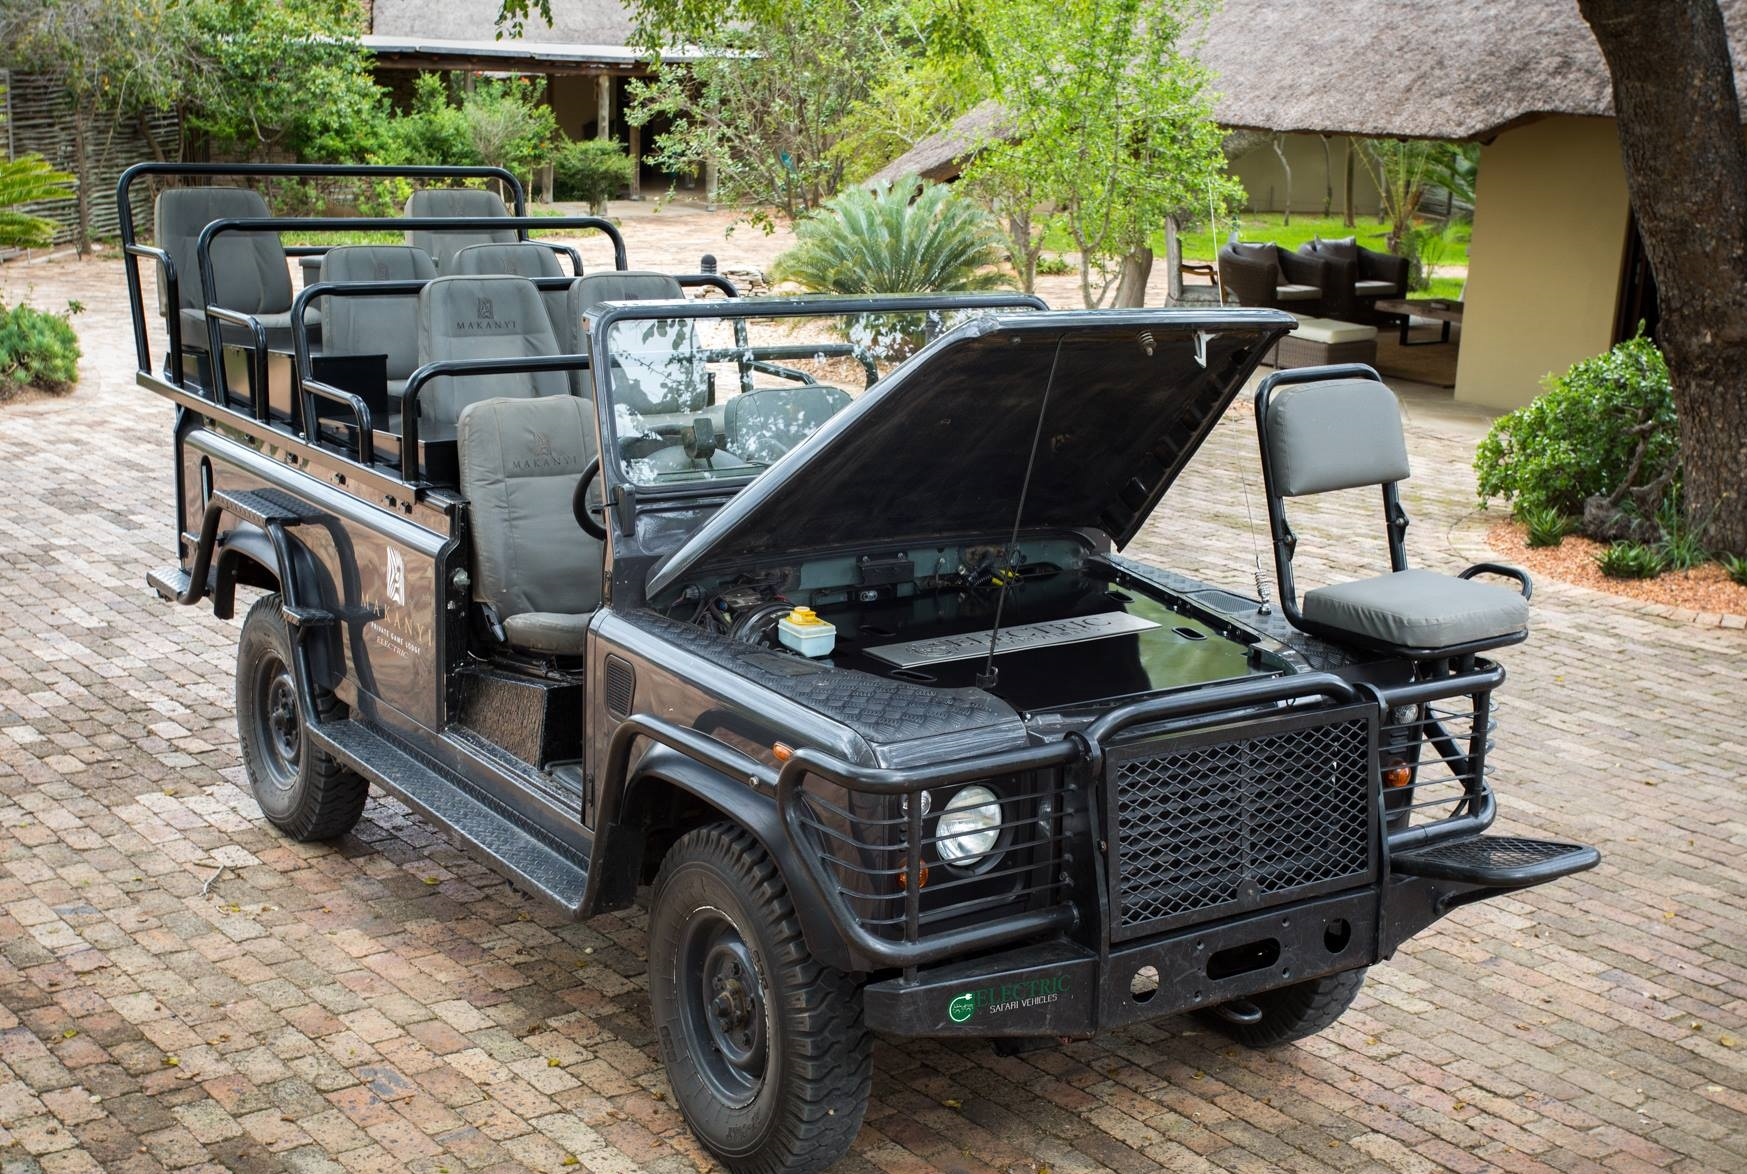 African Safari And Beach Holiday NewsAfrican Safari And